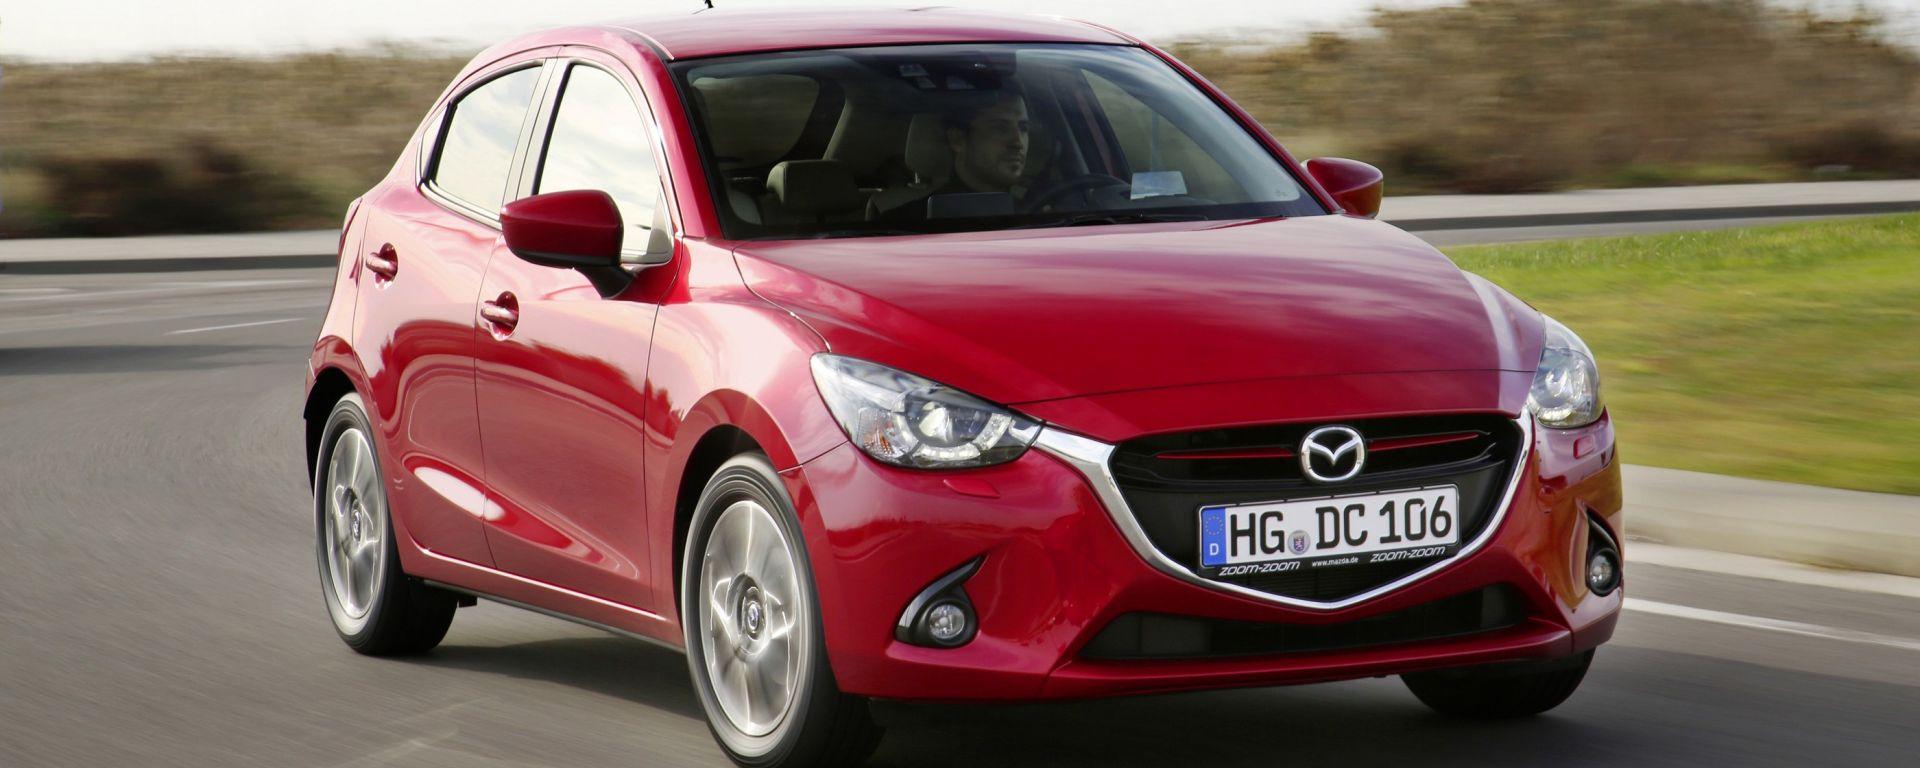 Mazda2 Diesel: domani è il Taste Drive Day